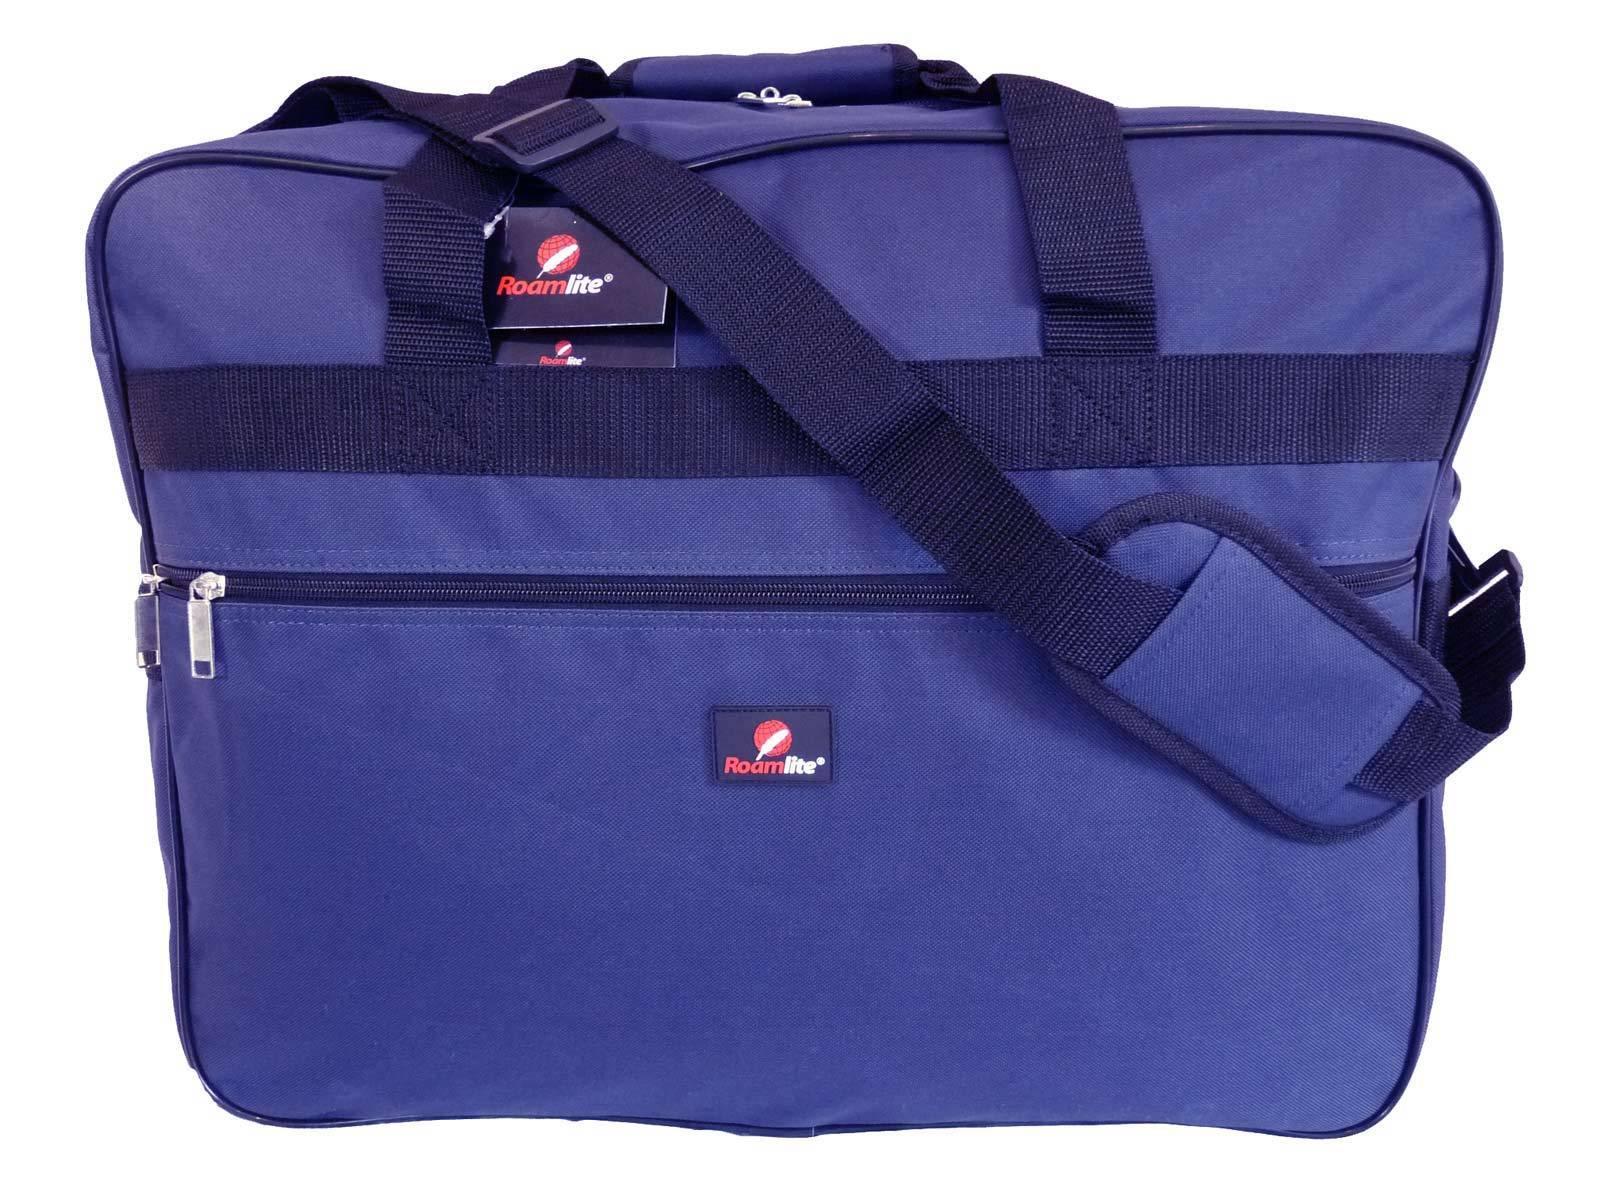 cabin hand baggage size holdall bag ryanair easyjet carry. Black Bedroom Furniture Sets. Home Design Ideas